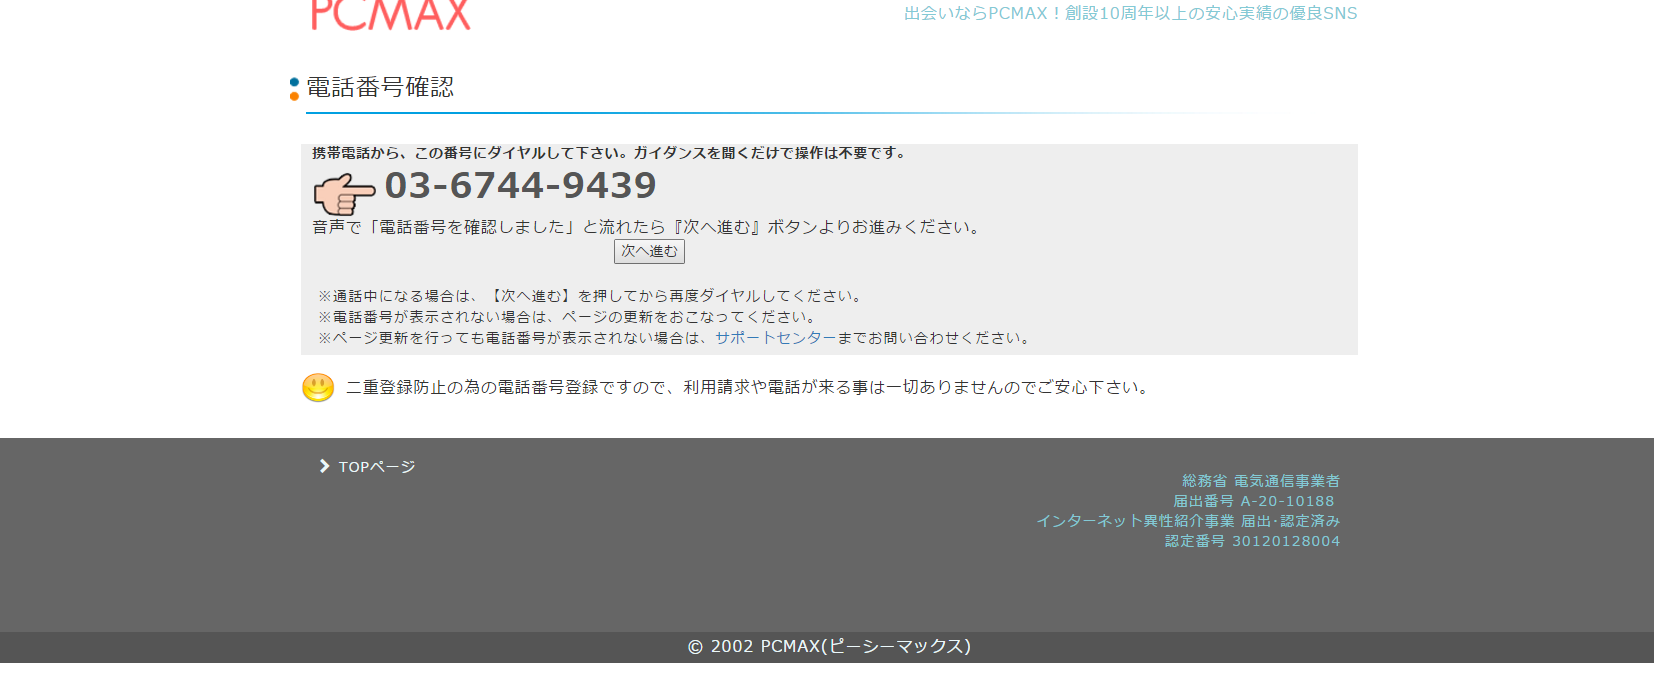 PCMAX登録 電話番号確認